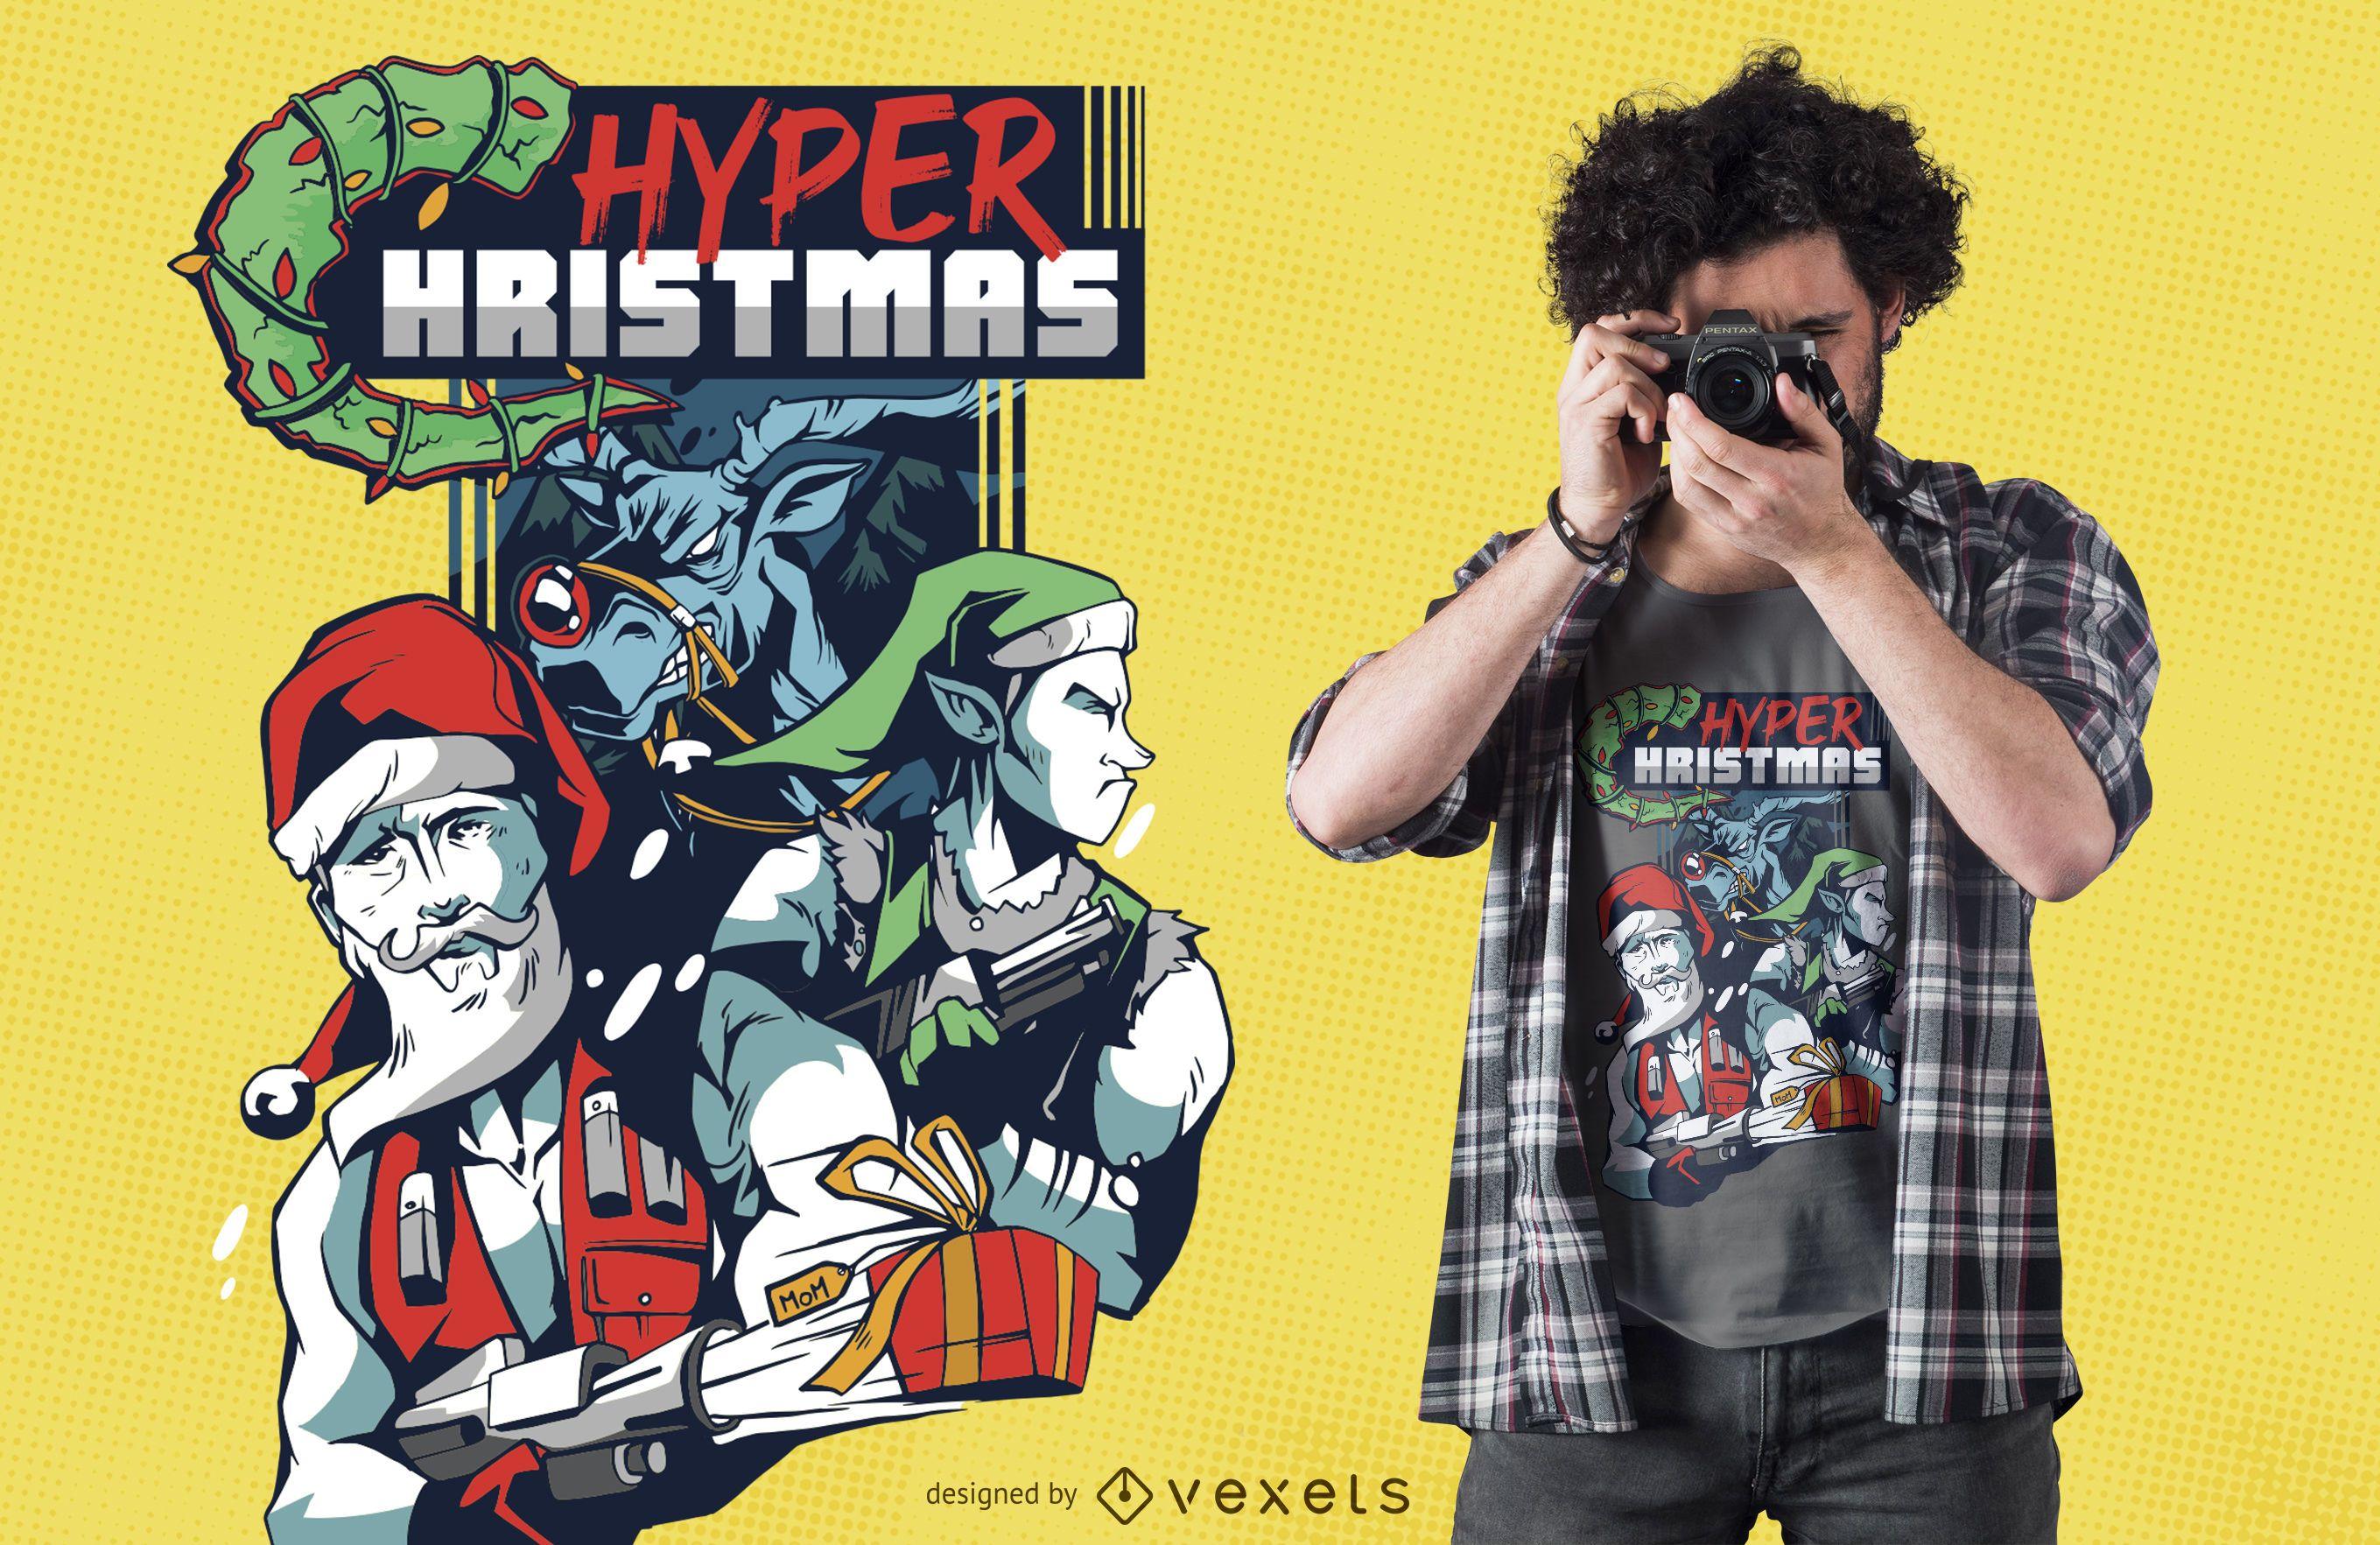 Hyper Christmas t-shirt design